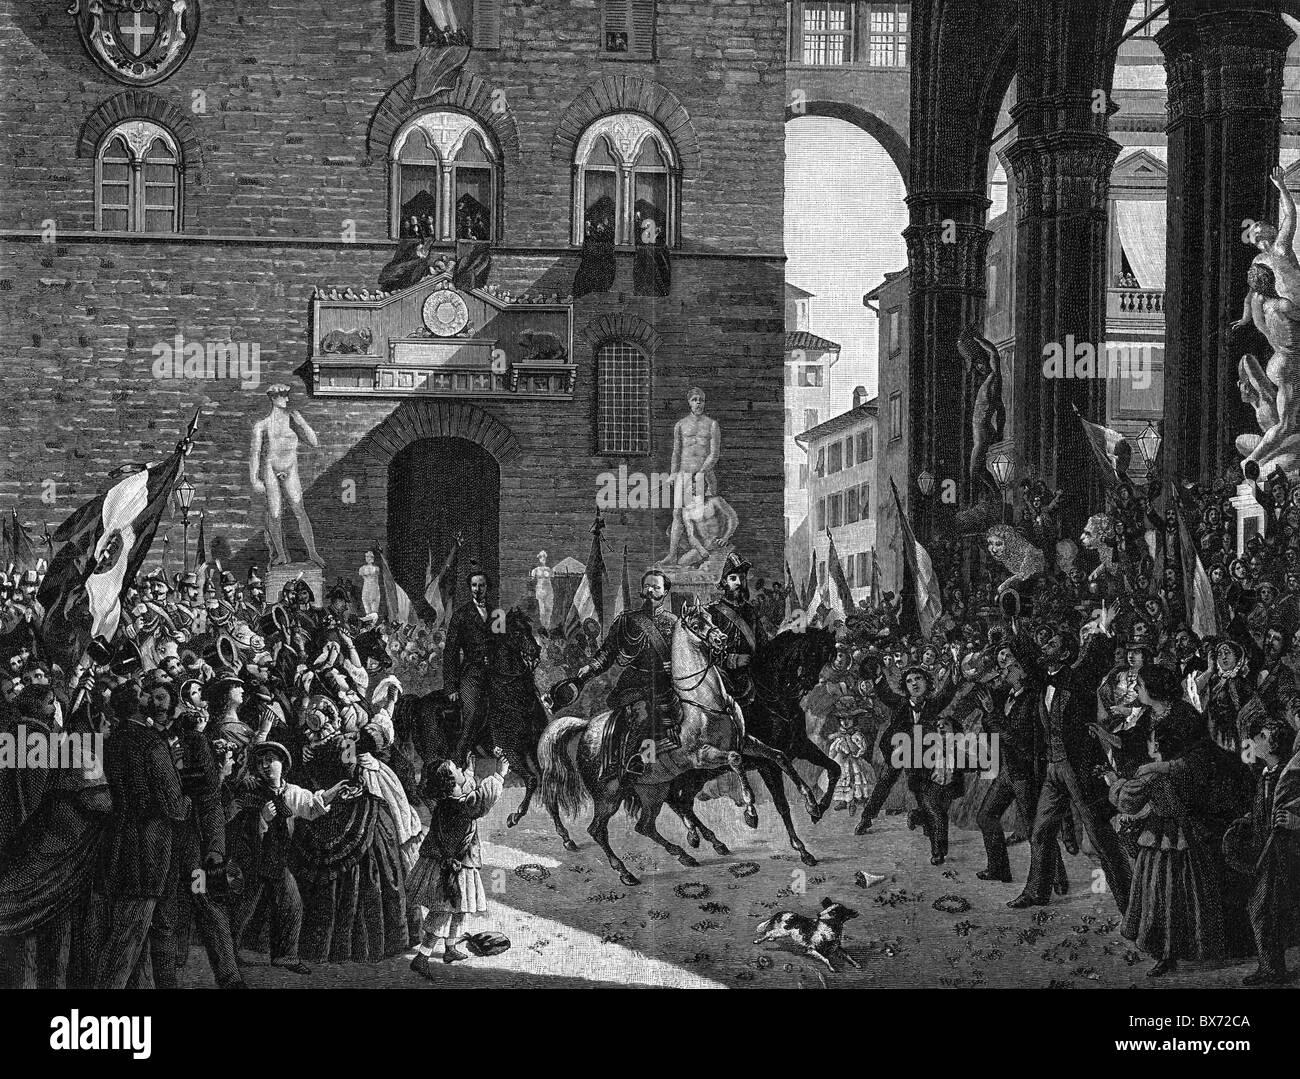 Victor Emmanuel II of Italy, 14.3.1820 - 9.1.1878, King of Italy 1861 - 1878, scene, Victor Emmanuel II entering Stock Photo